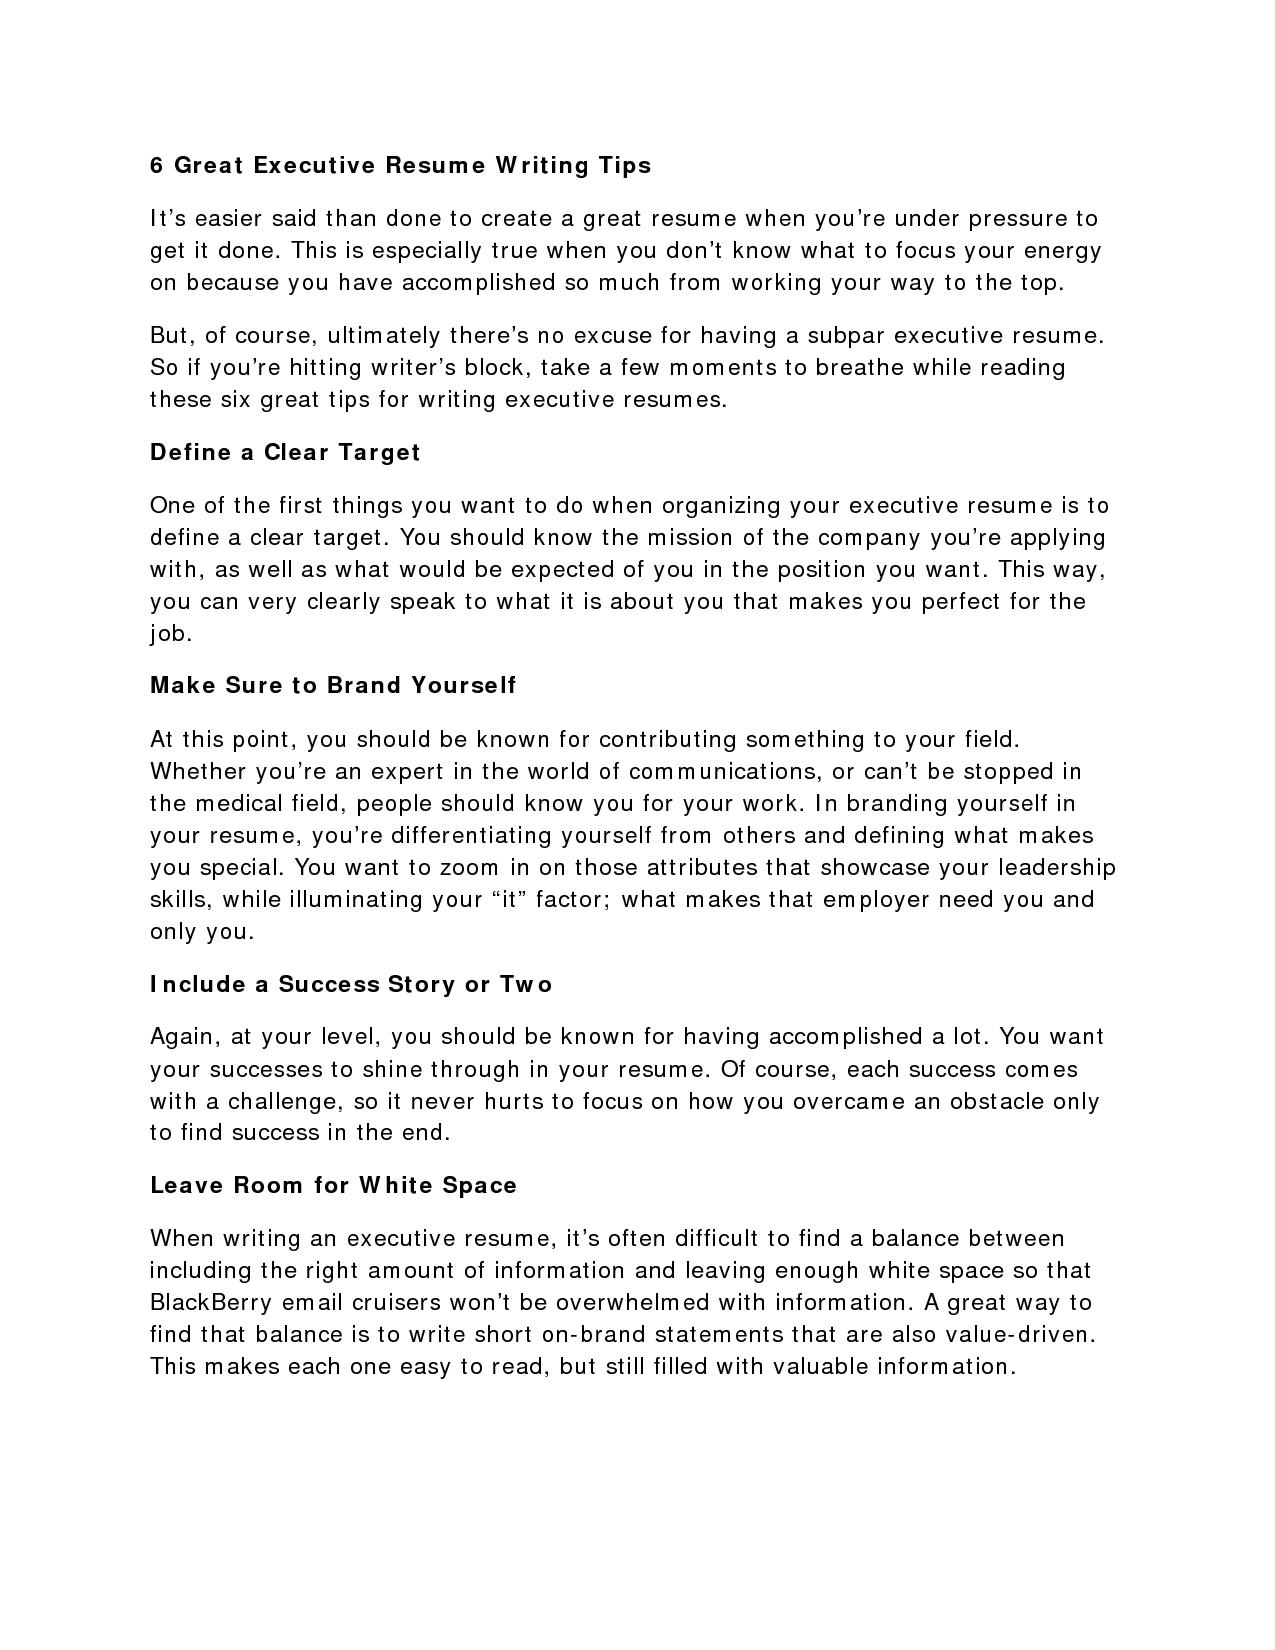 Career21st  Resume writing, Resume writing tips, Unique resume